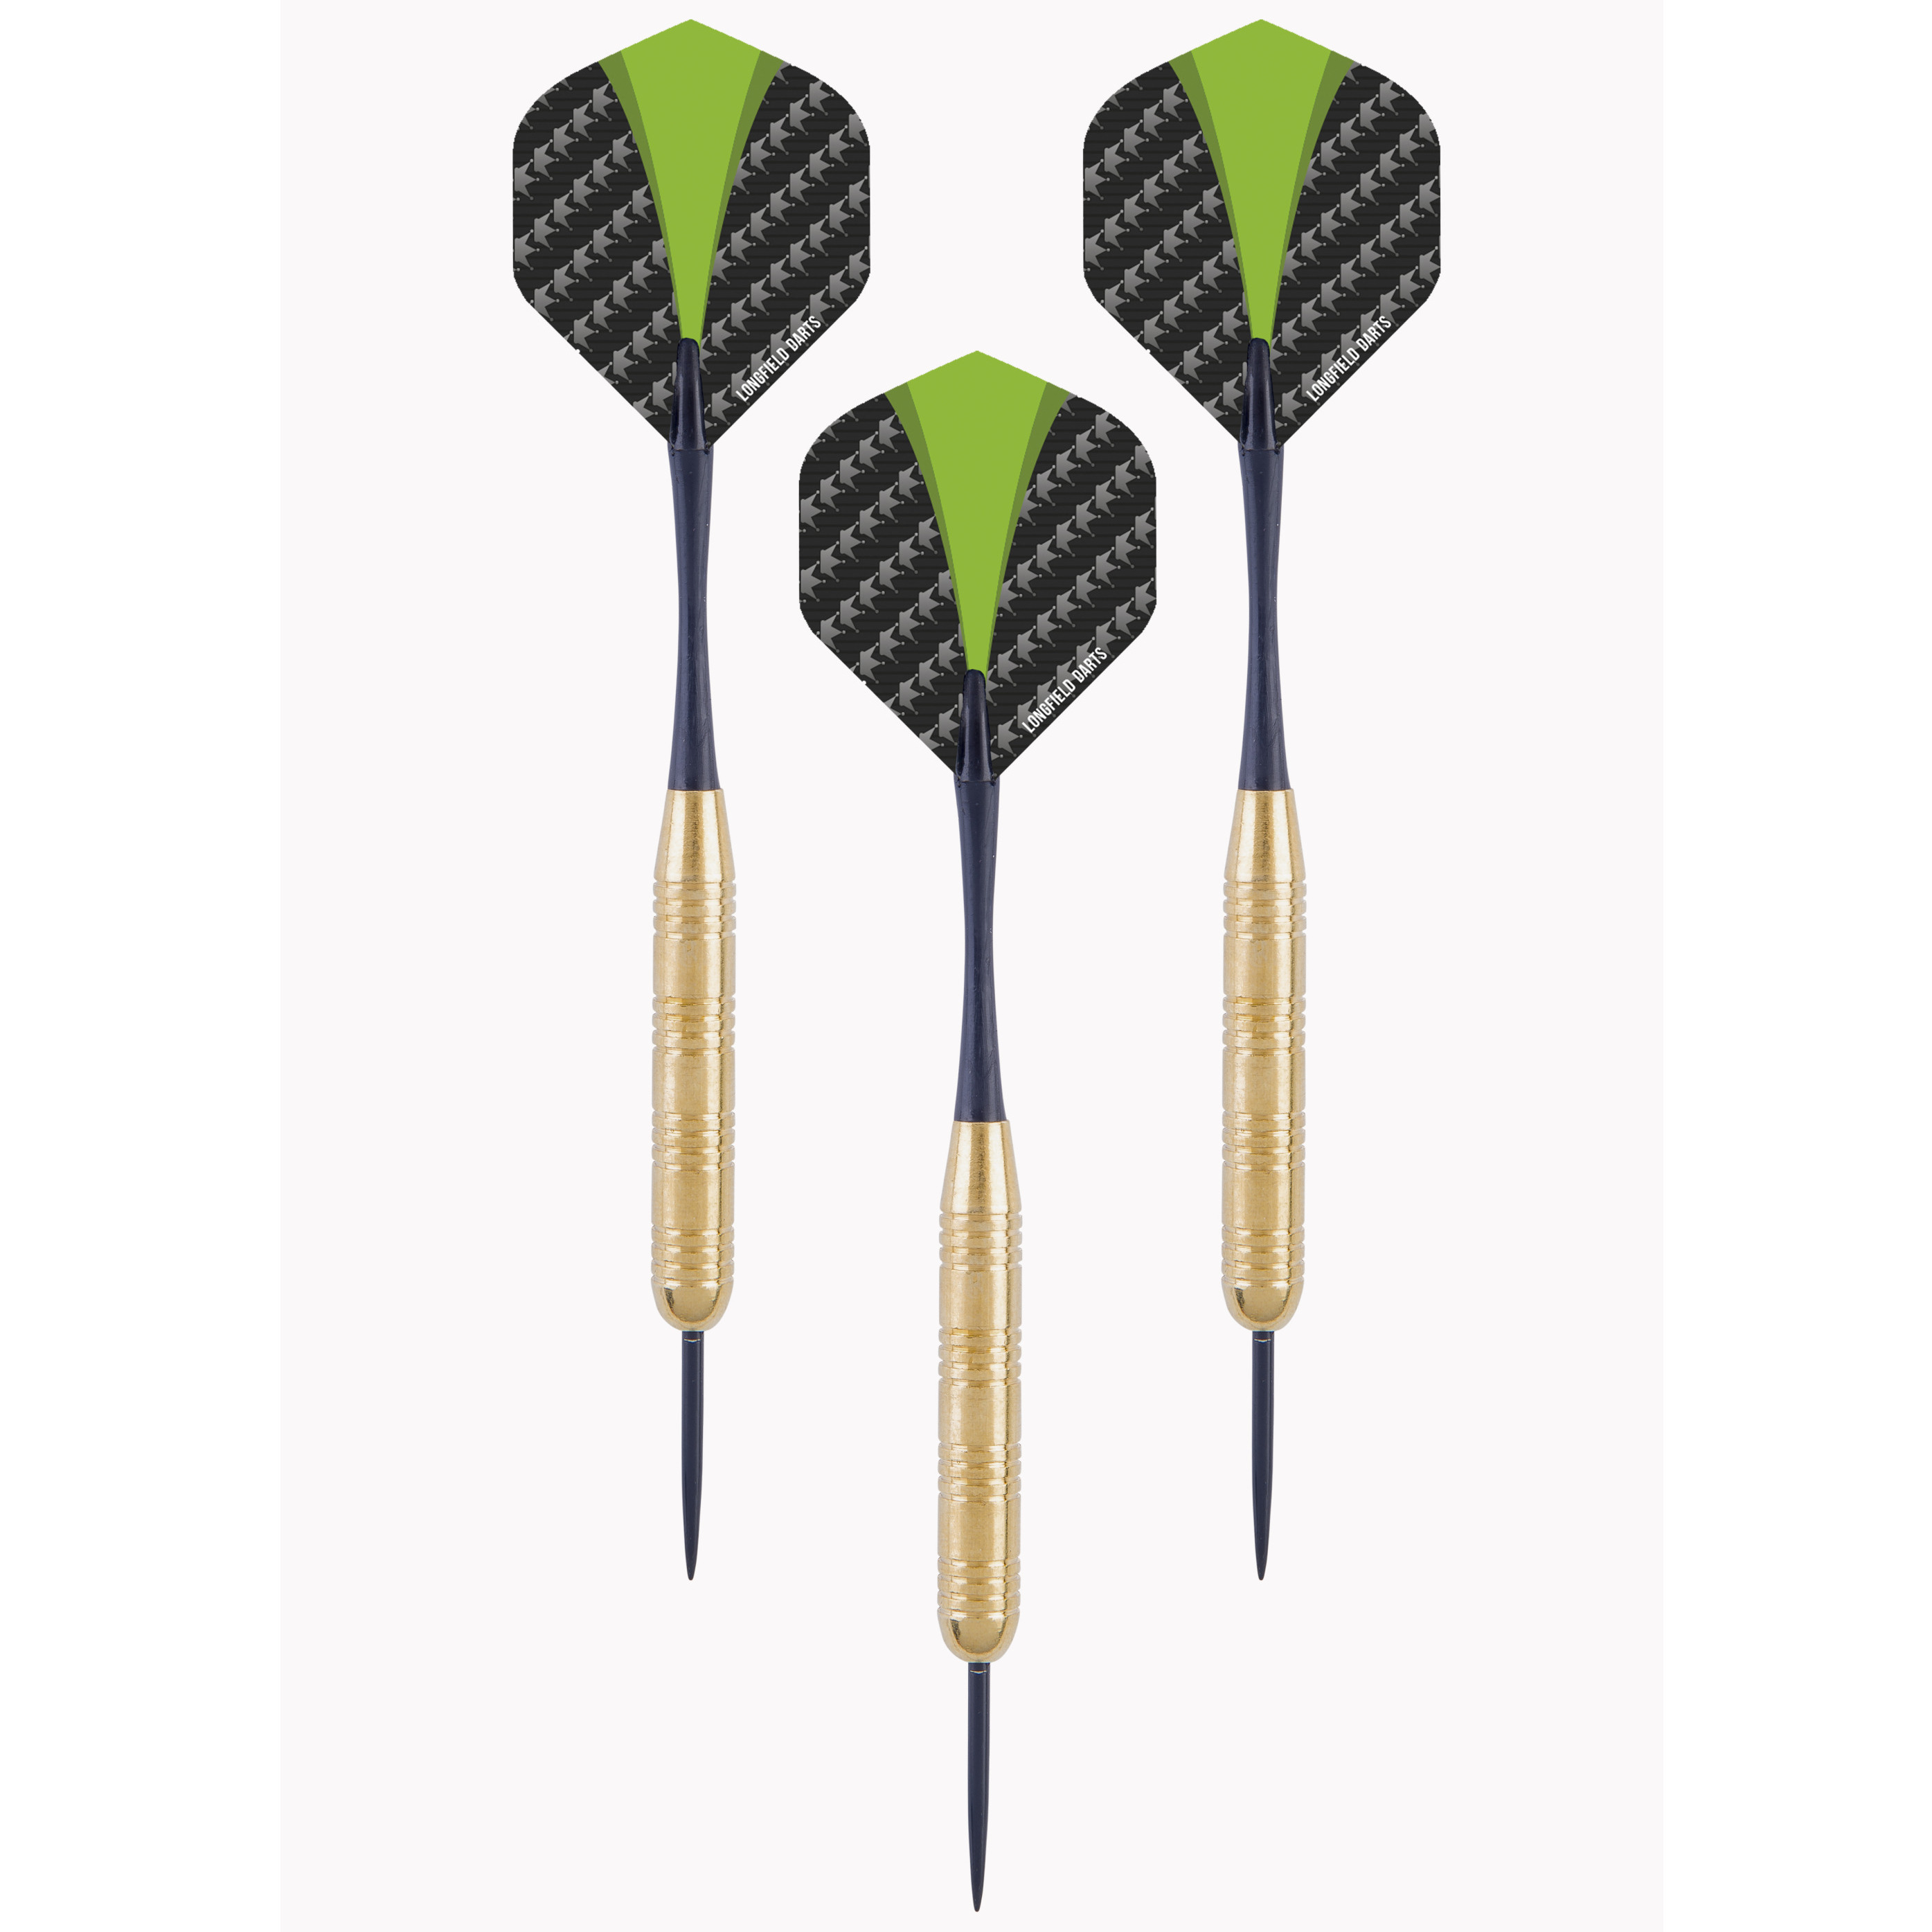 1x Set van 3 dartpijlen Longfield darts brass 21 grams